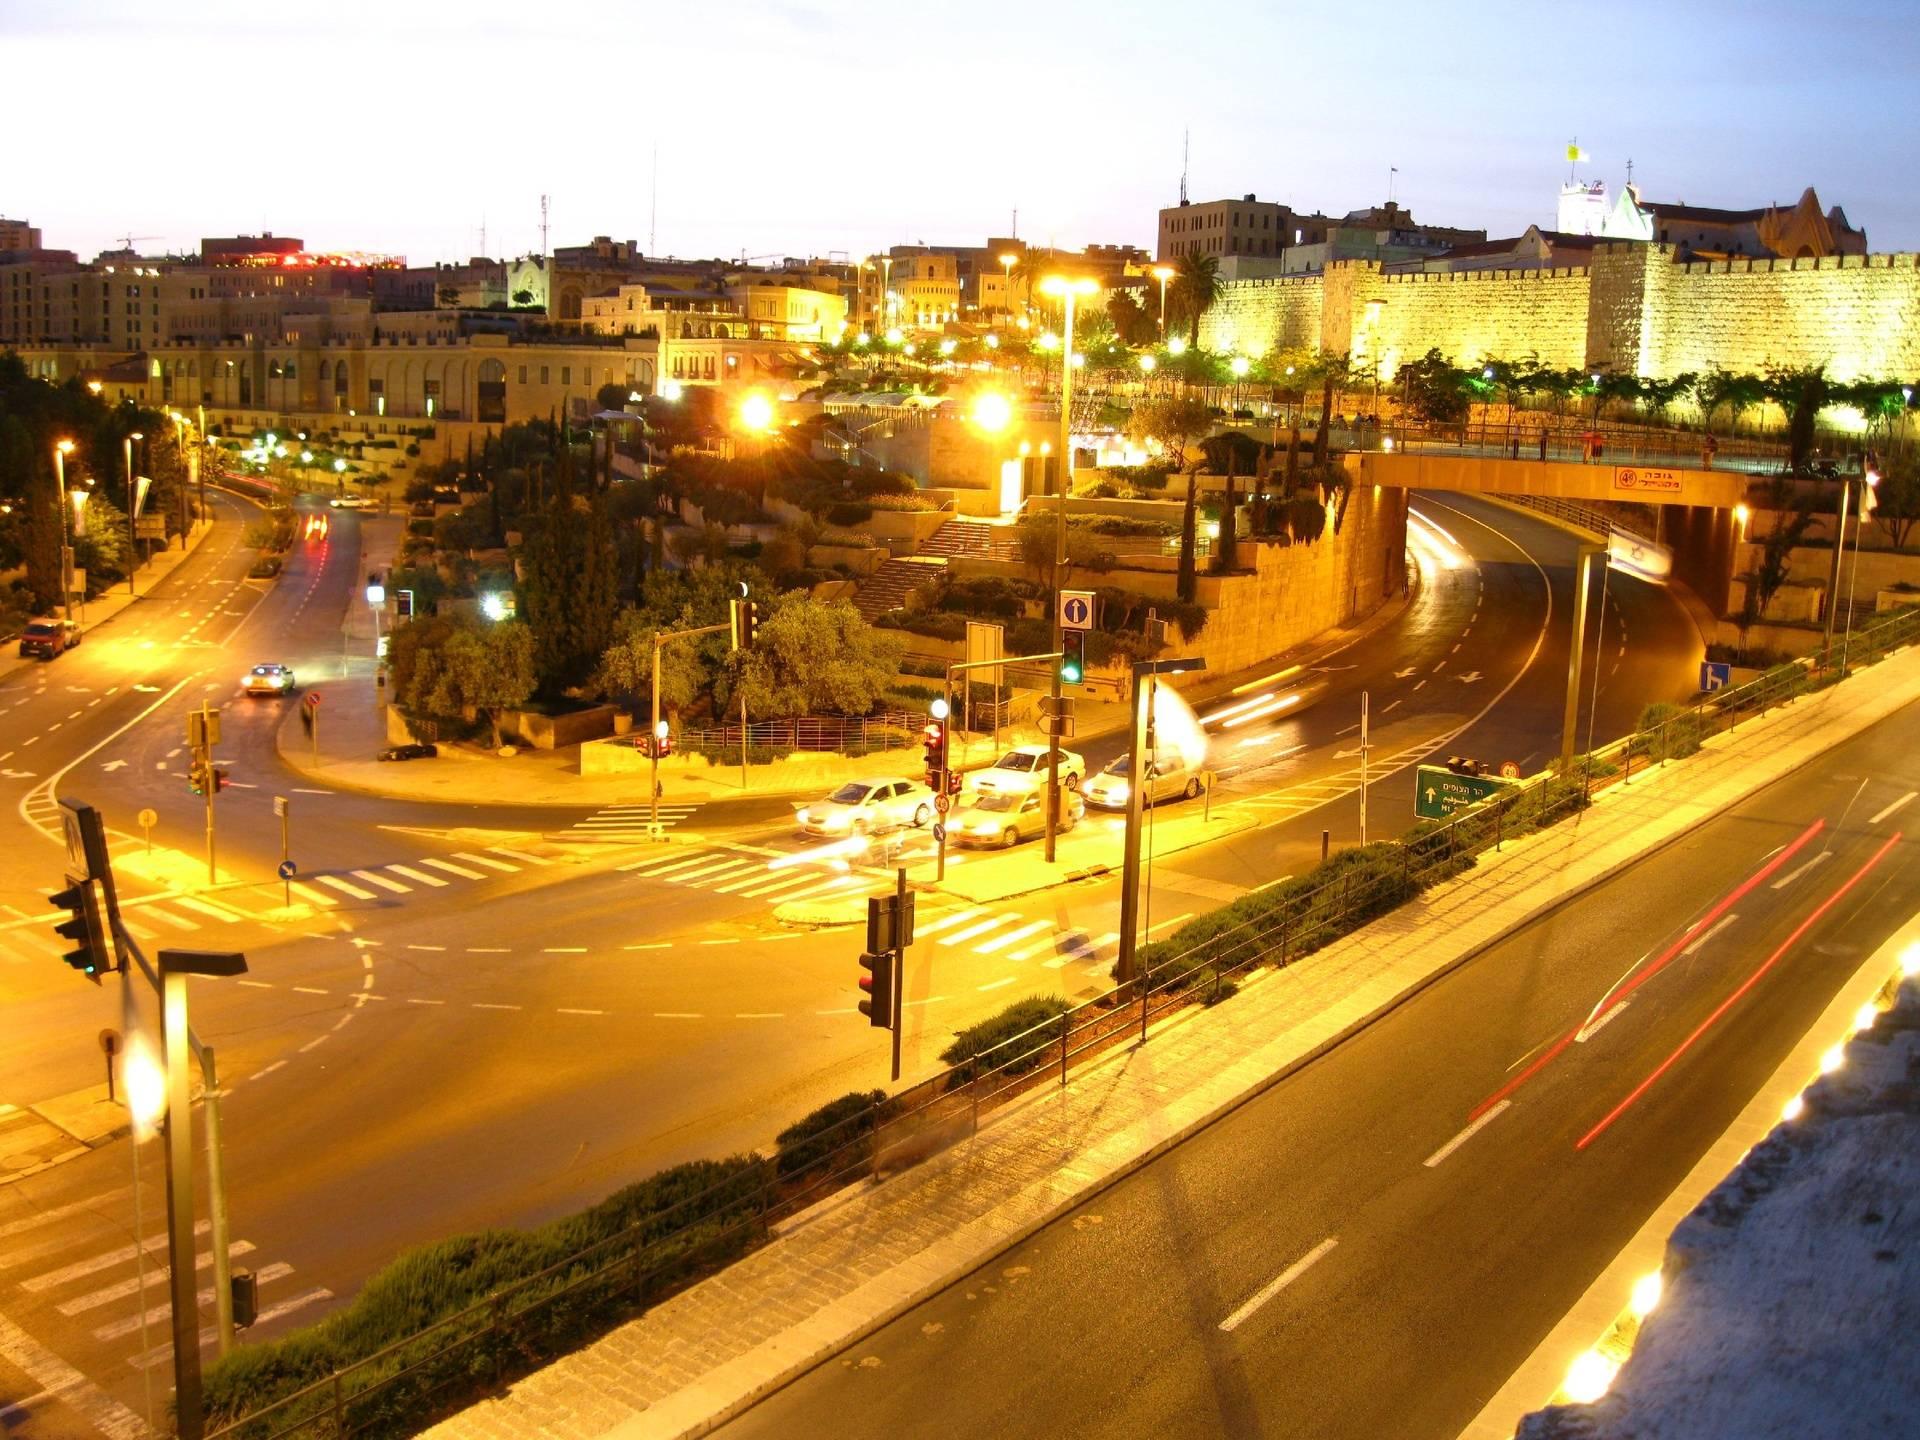 City Streets at Night 2